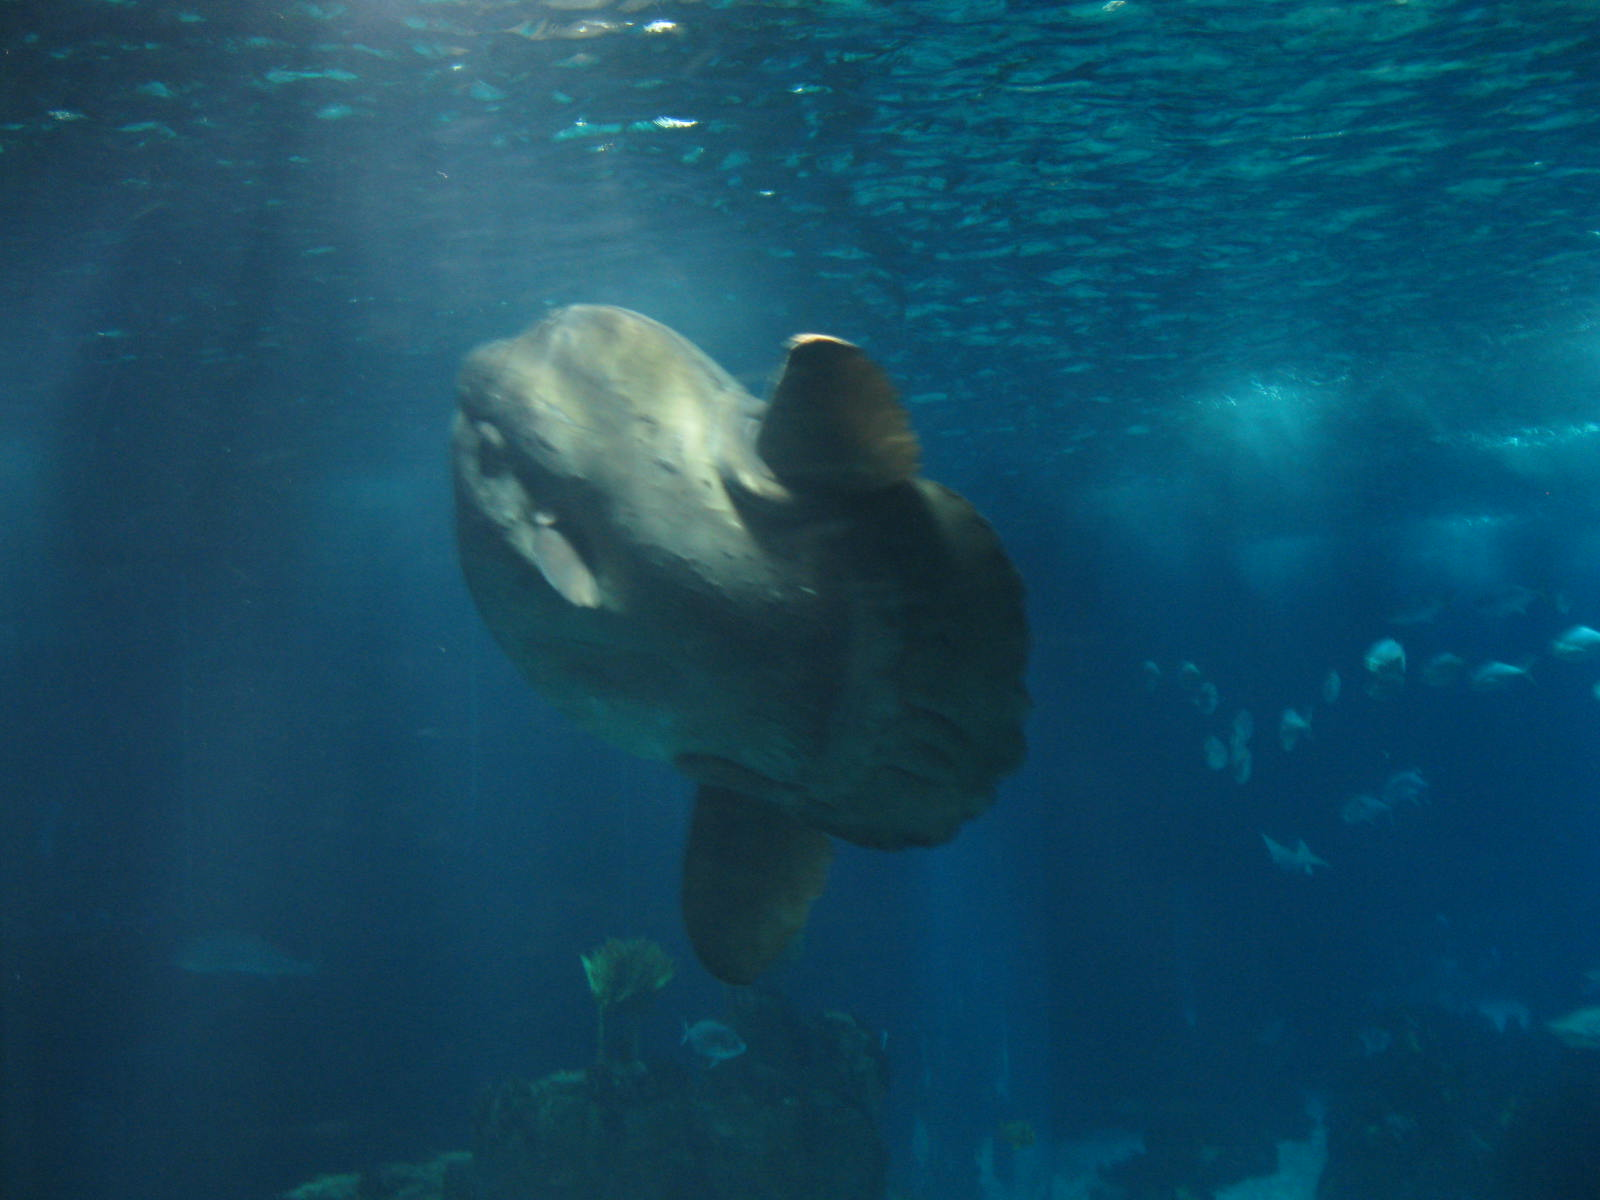 File Biggest Fish In The Aquarium Jpg Wikimedia Commons